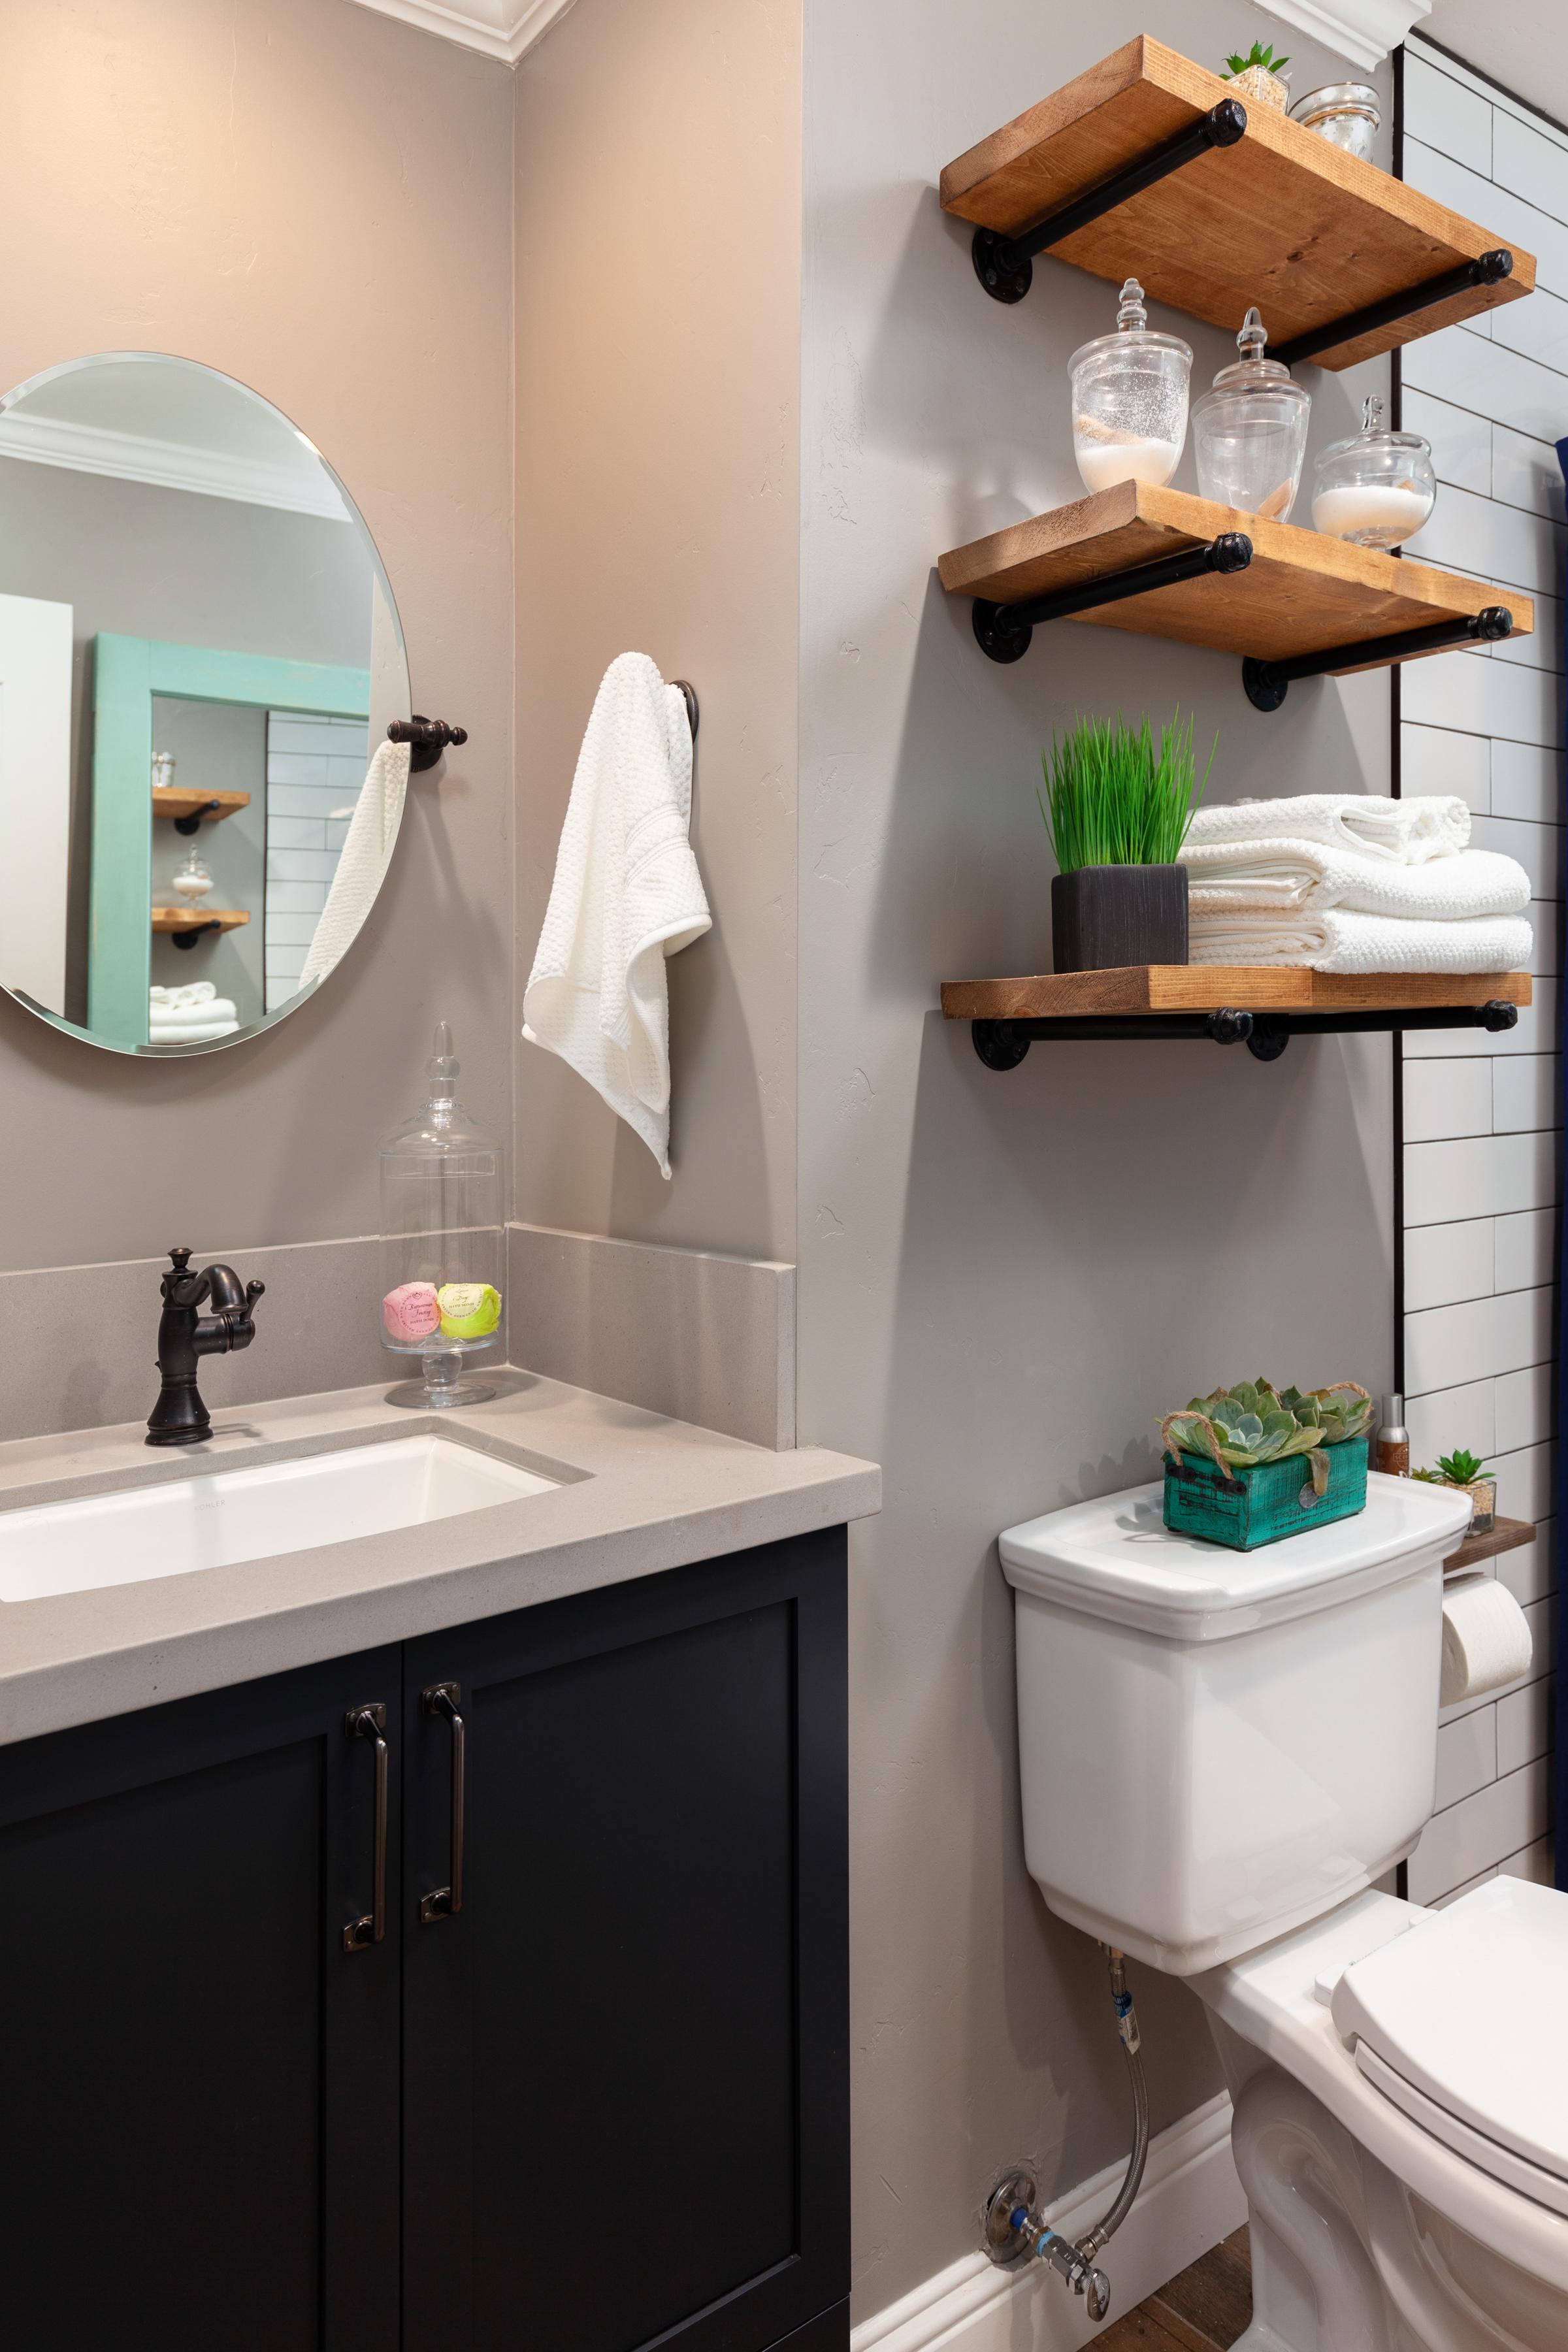 Loma Linda Bathroom Remodel